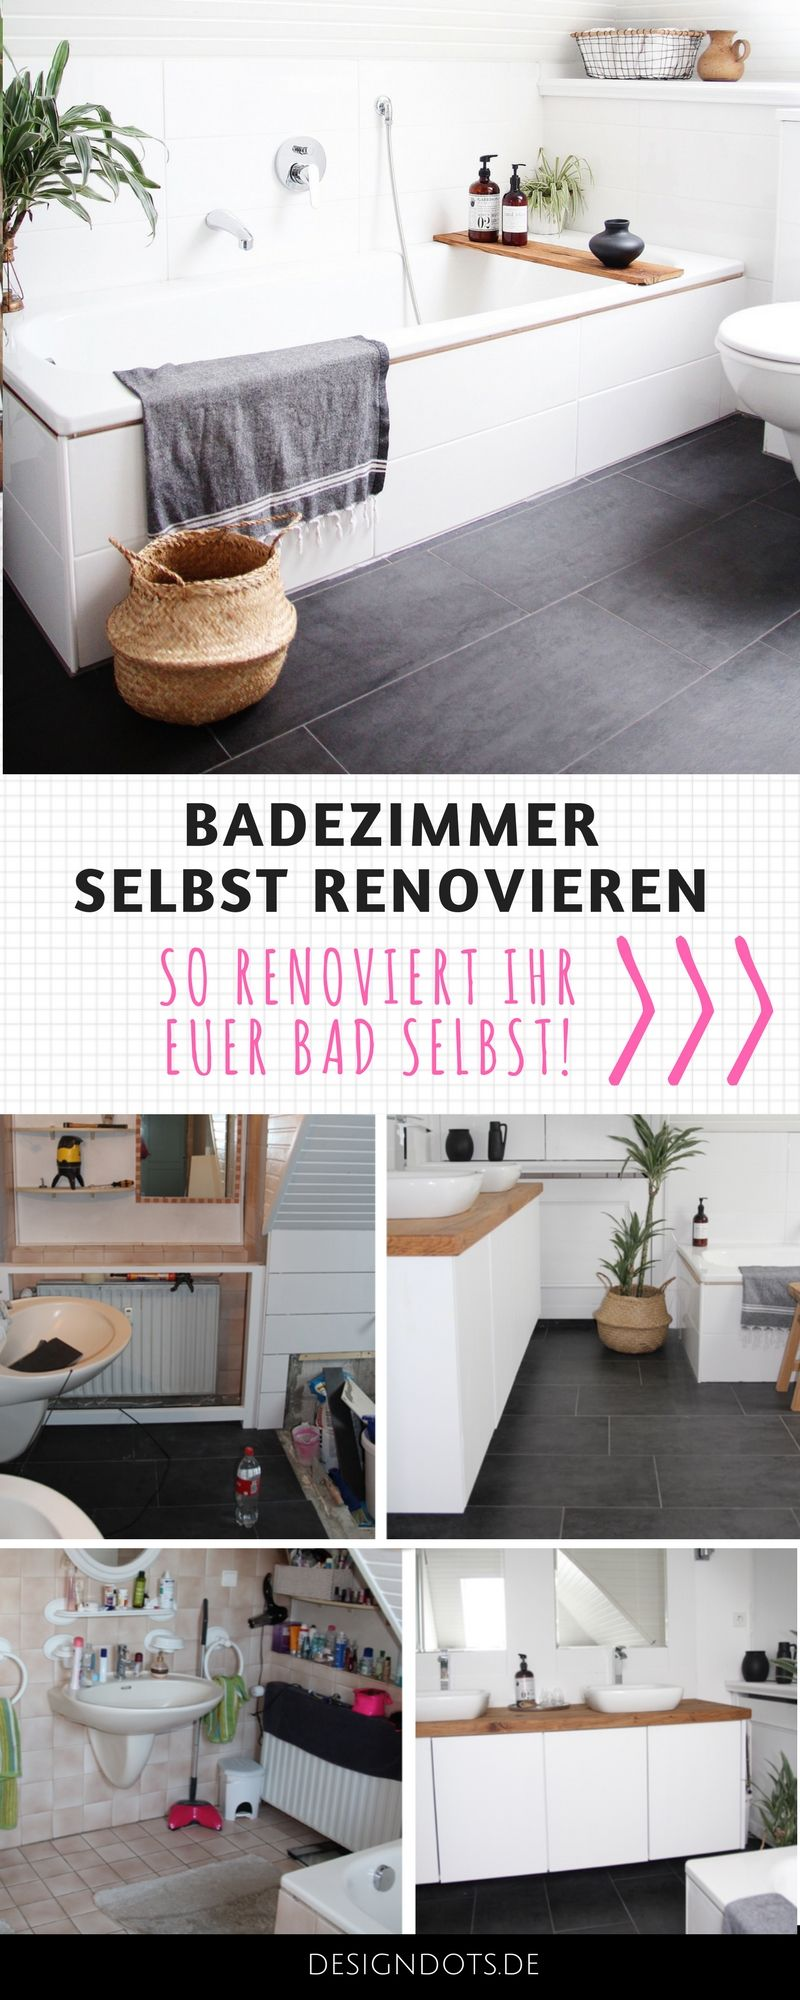 Badezimmer Selbst Renovieren Bad Renovieren Kosten Wohnung Renovieren Und Badezimmer Renovieren